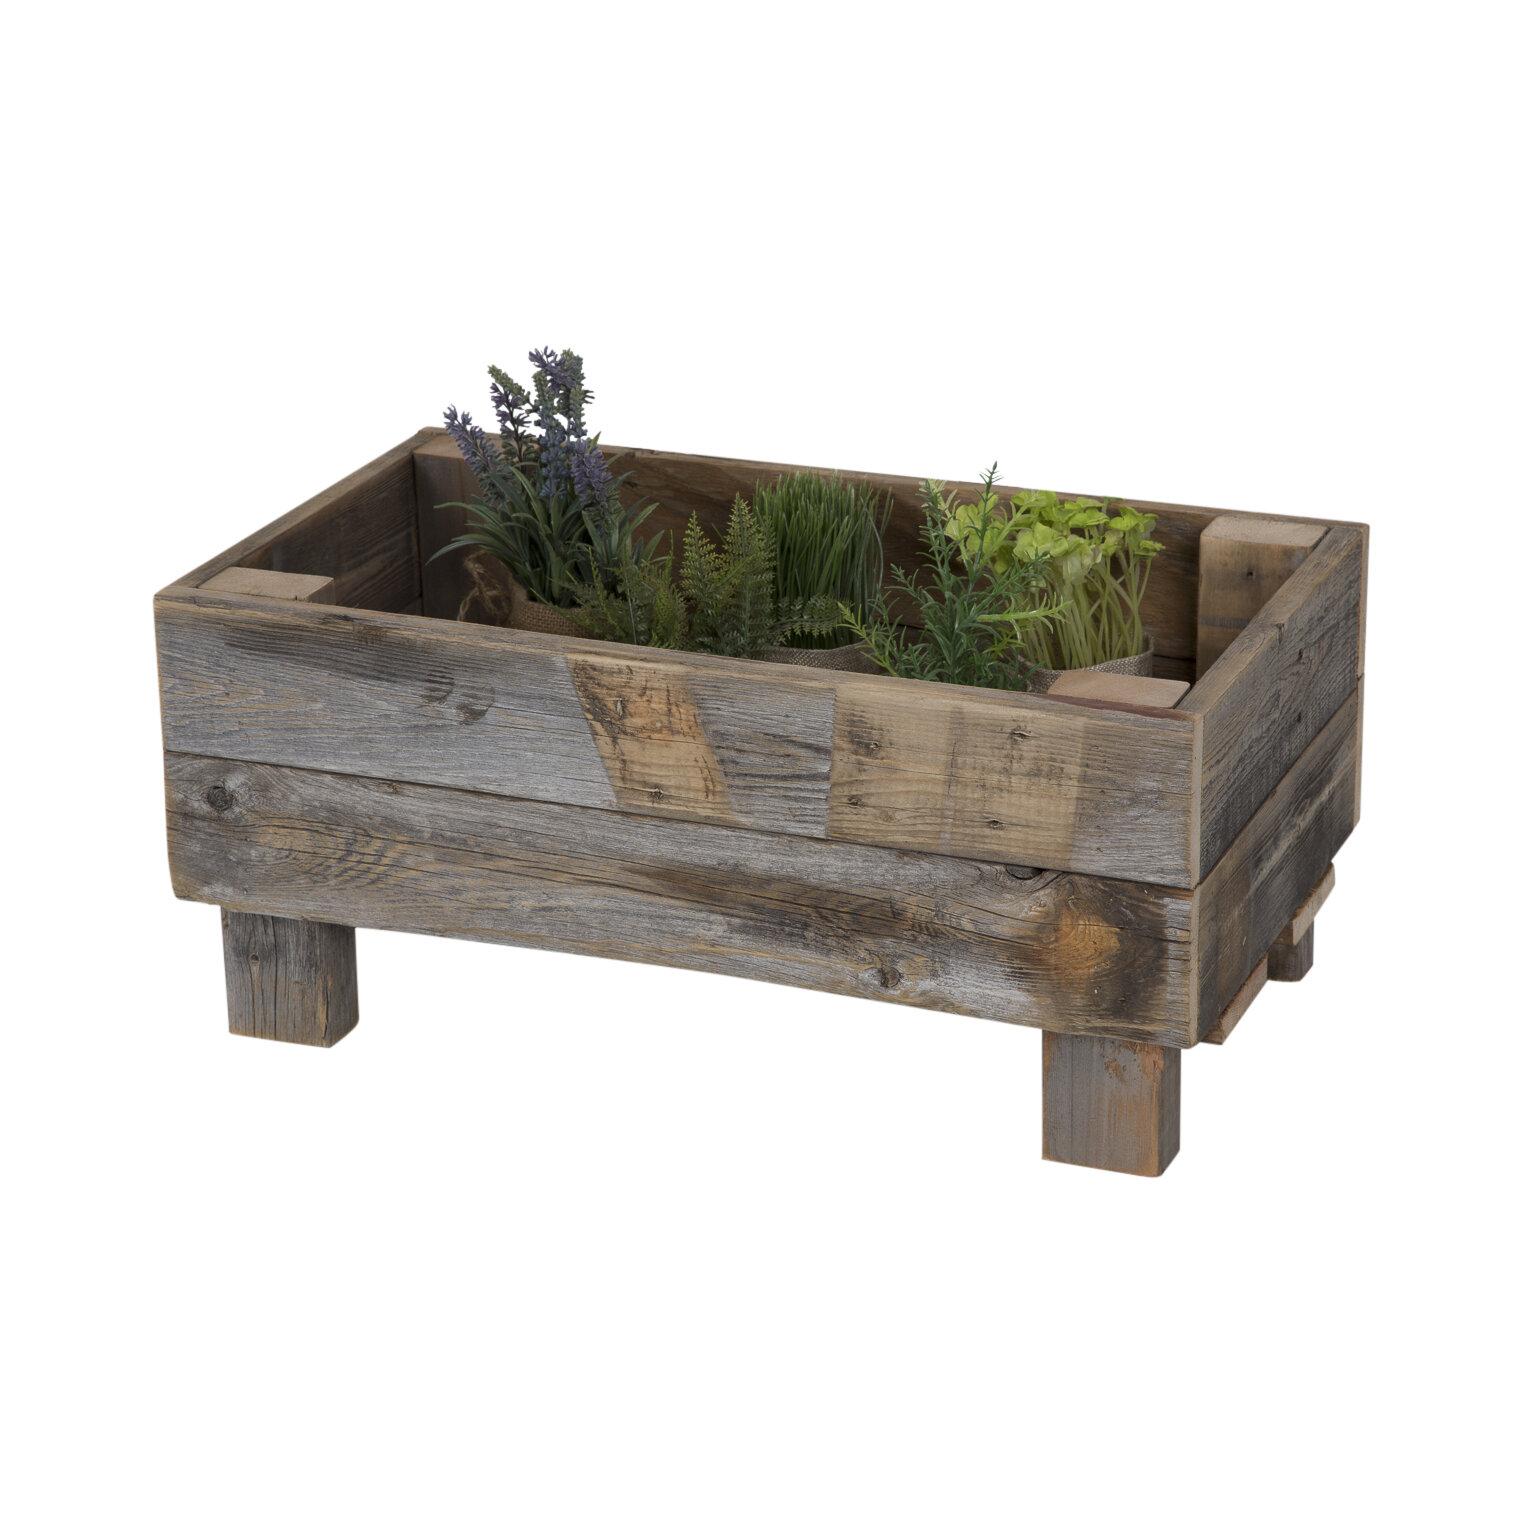 DelHutsonDesigns Reclaimed Wood Planter Box u0026